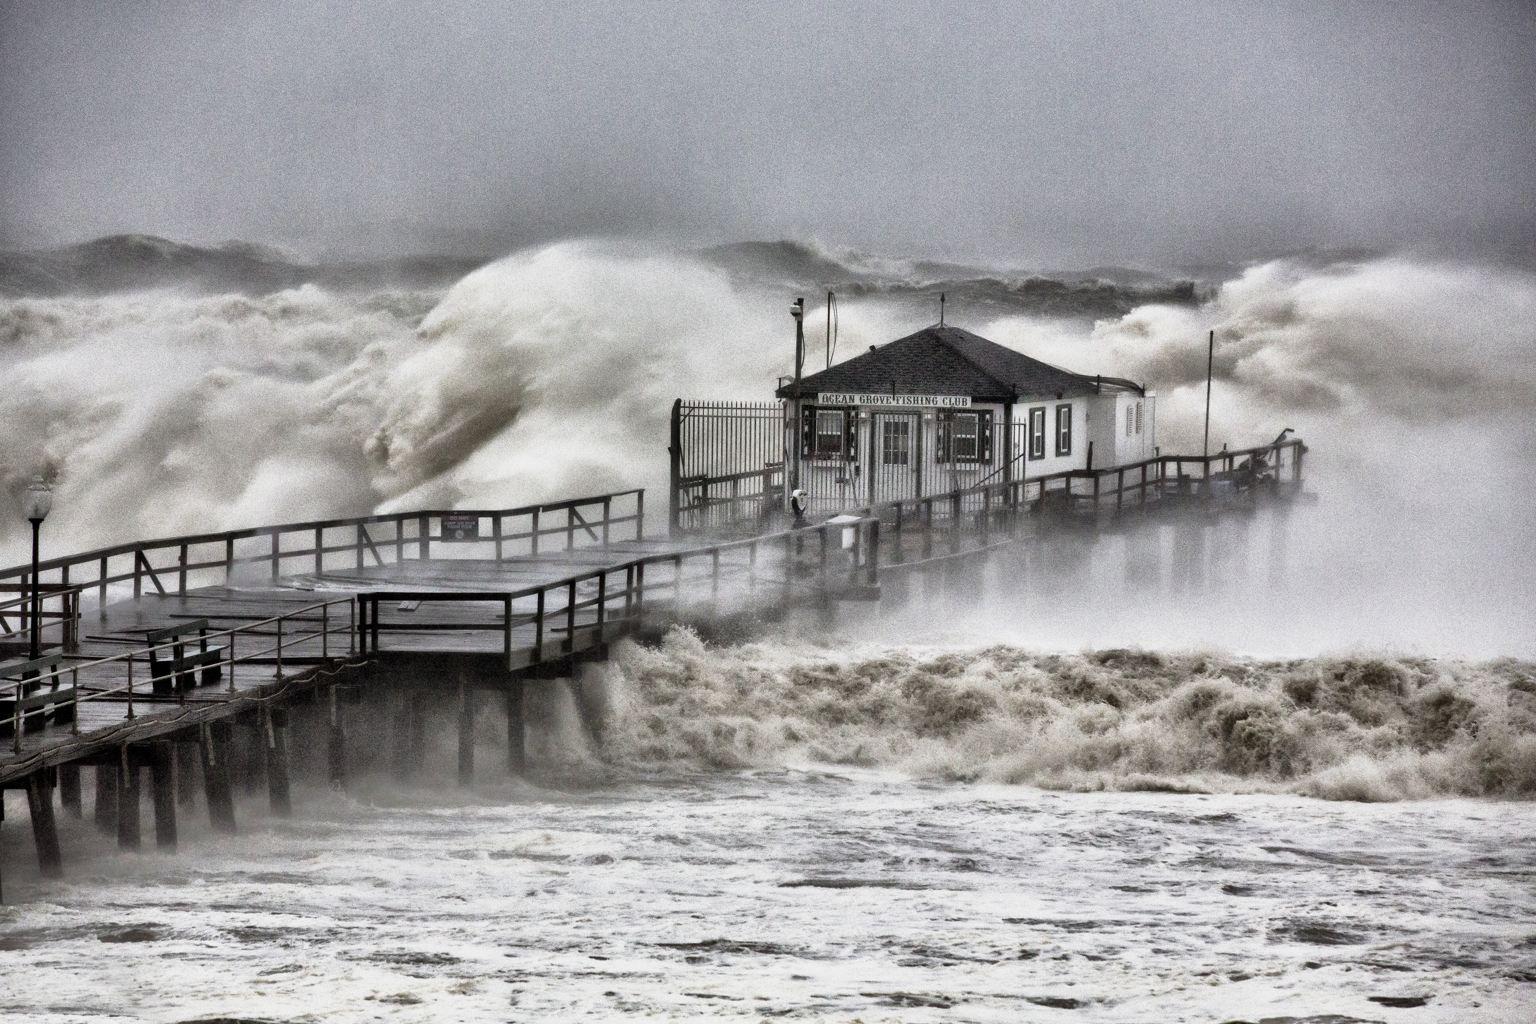 Hurricane Sandy Ocean Grove Pier Nj By Bob Bowne Hurricane Sandy Hurricane Ocean Grove